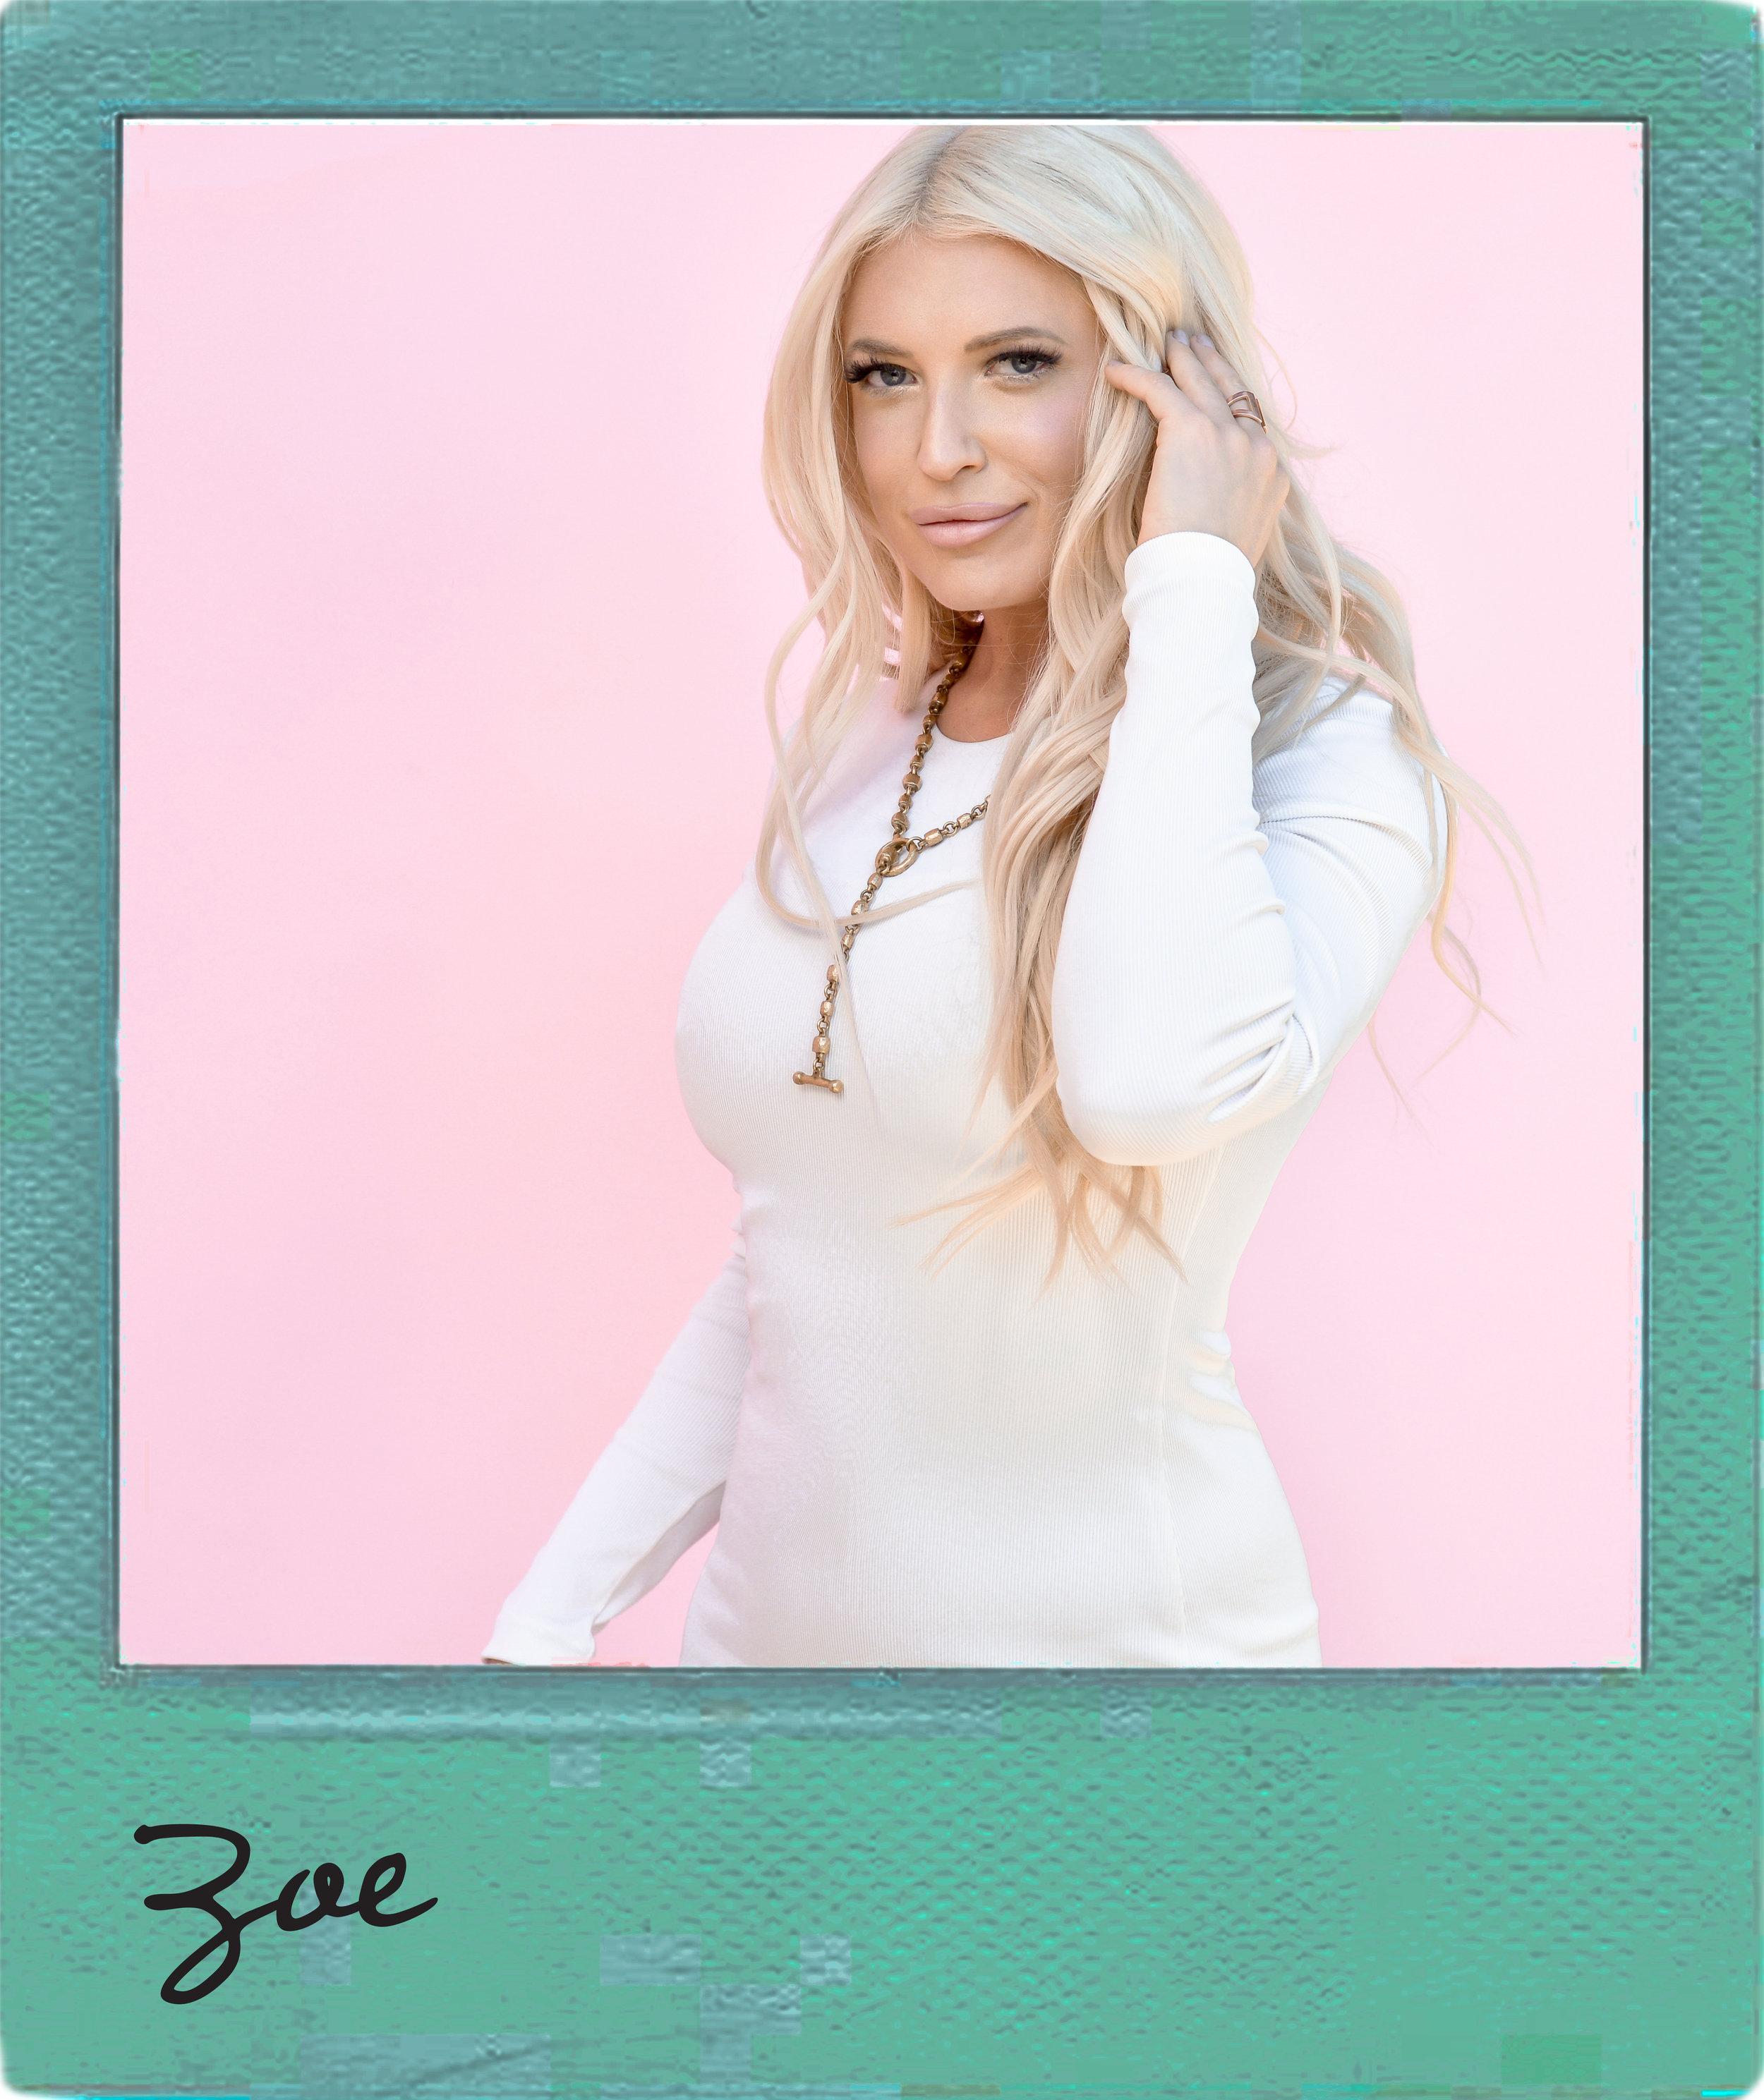 Zoe_Polaroid.jpg